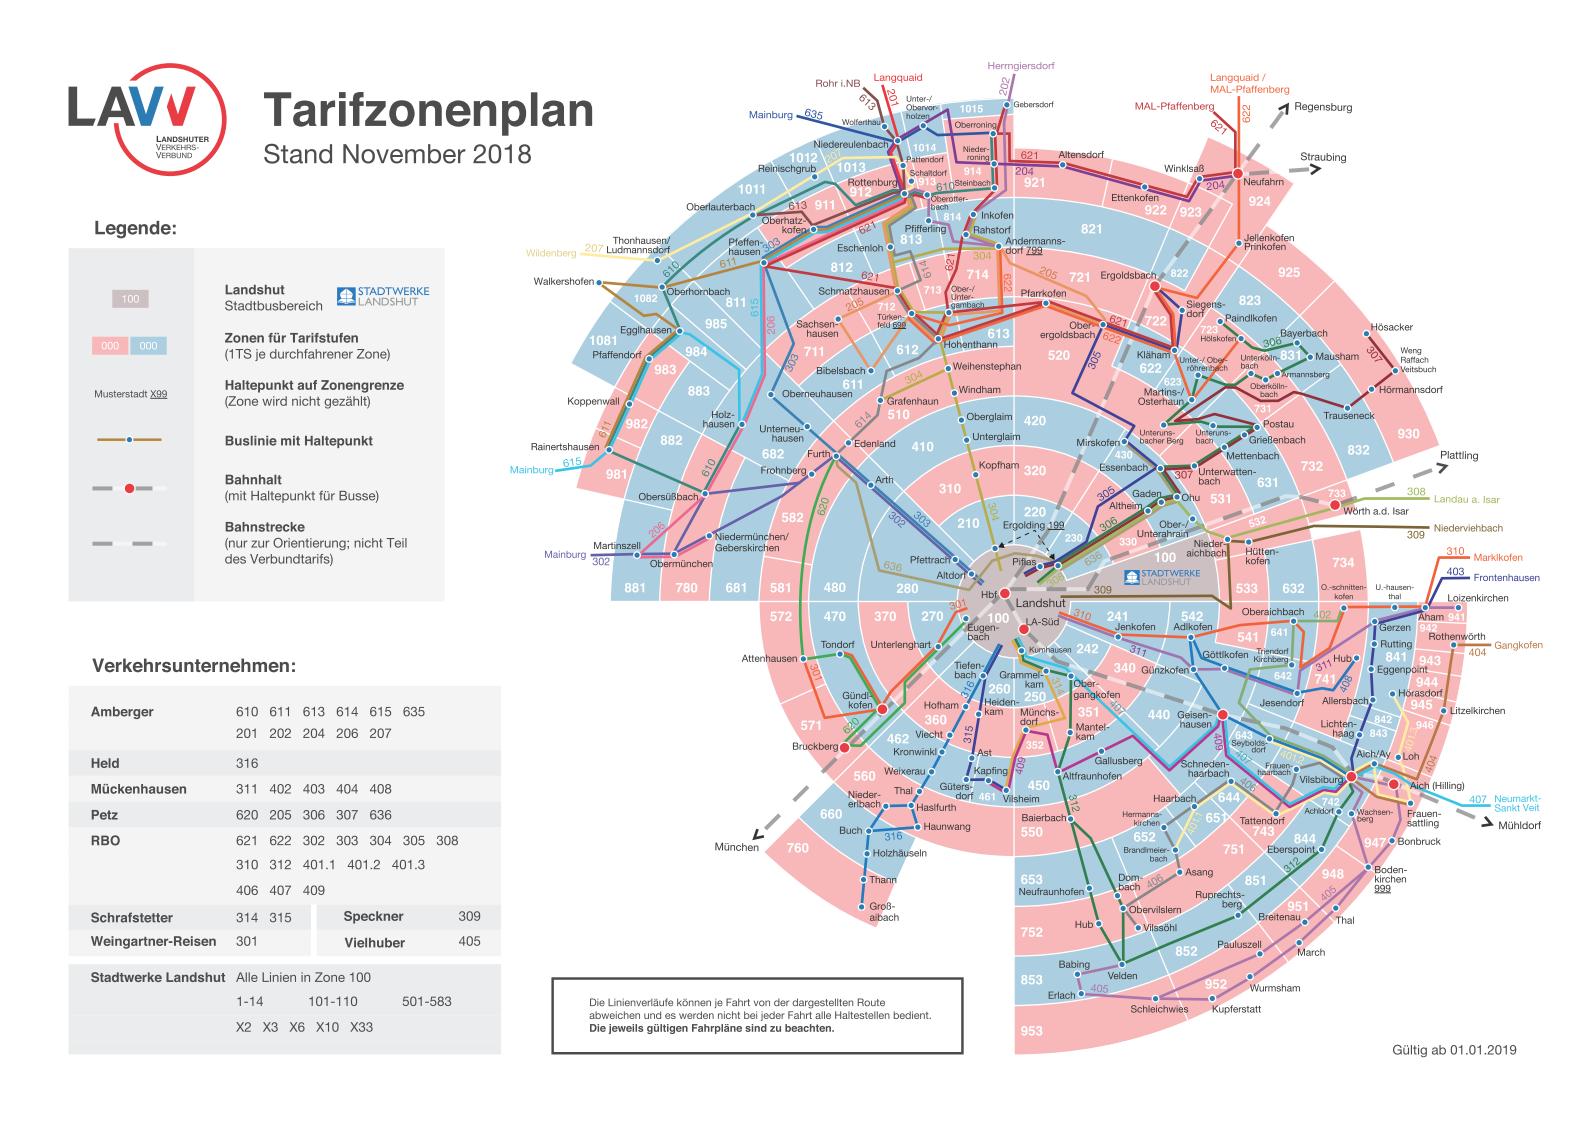 Landshuter Tarifzonenplan